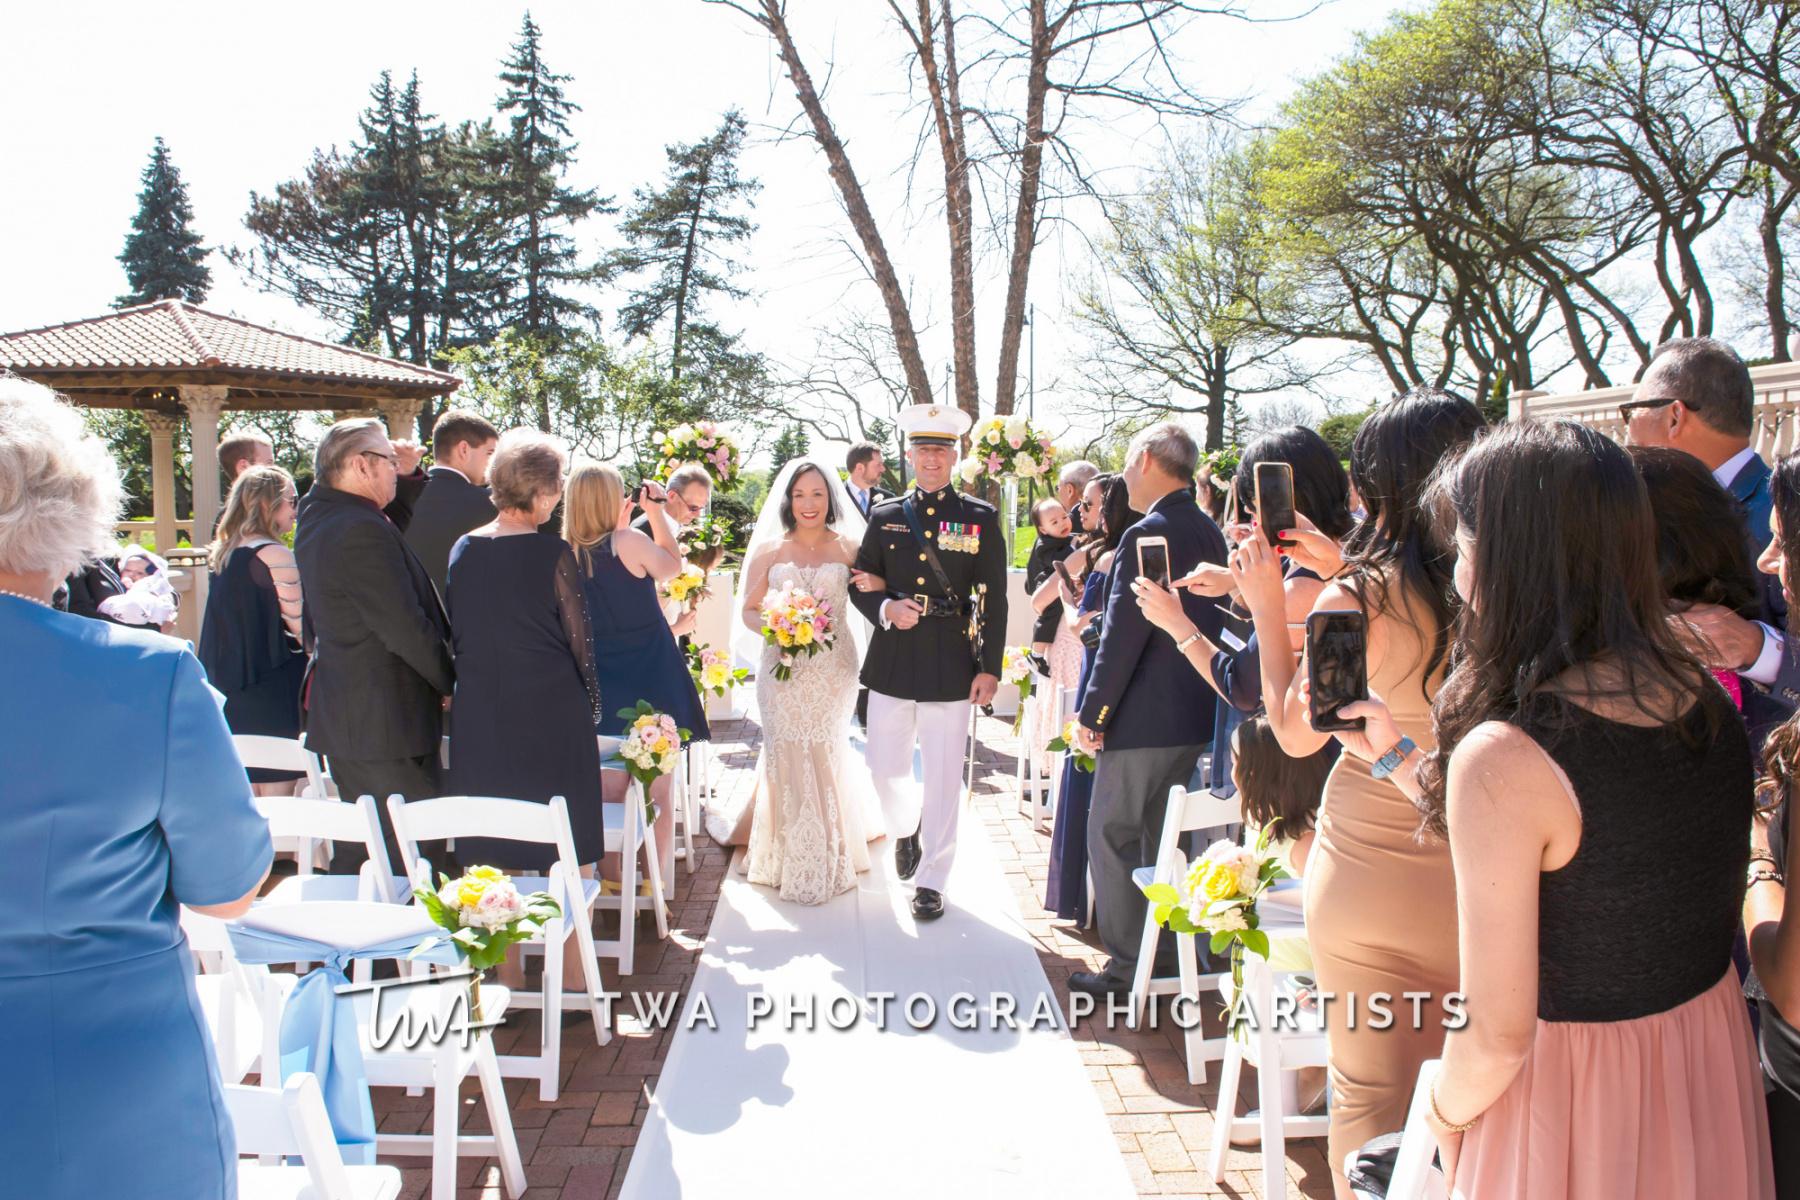 Chicago-Wedding-Photographer-TWA-Photographic-Artists-Drake-Oakbrook_Bermas_Zweifeld-0409